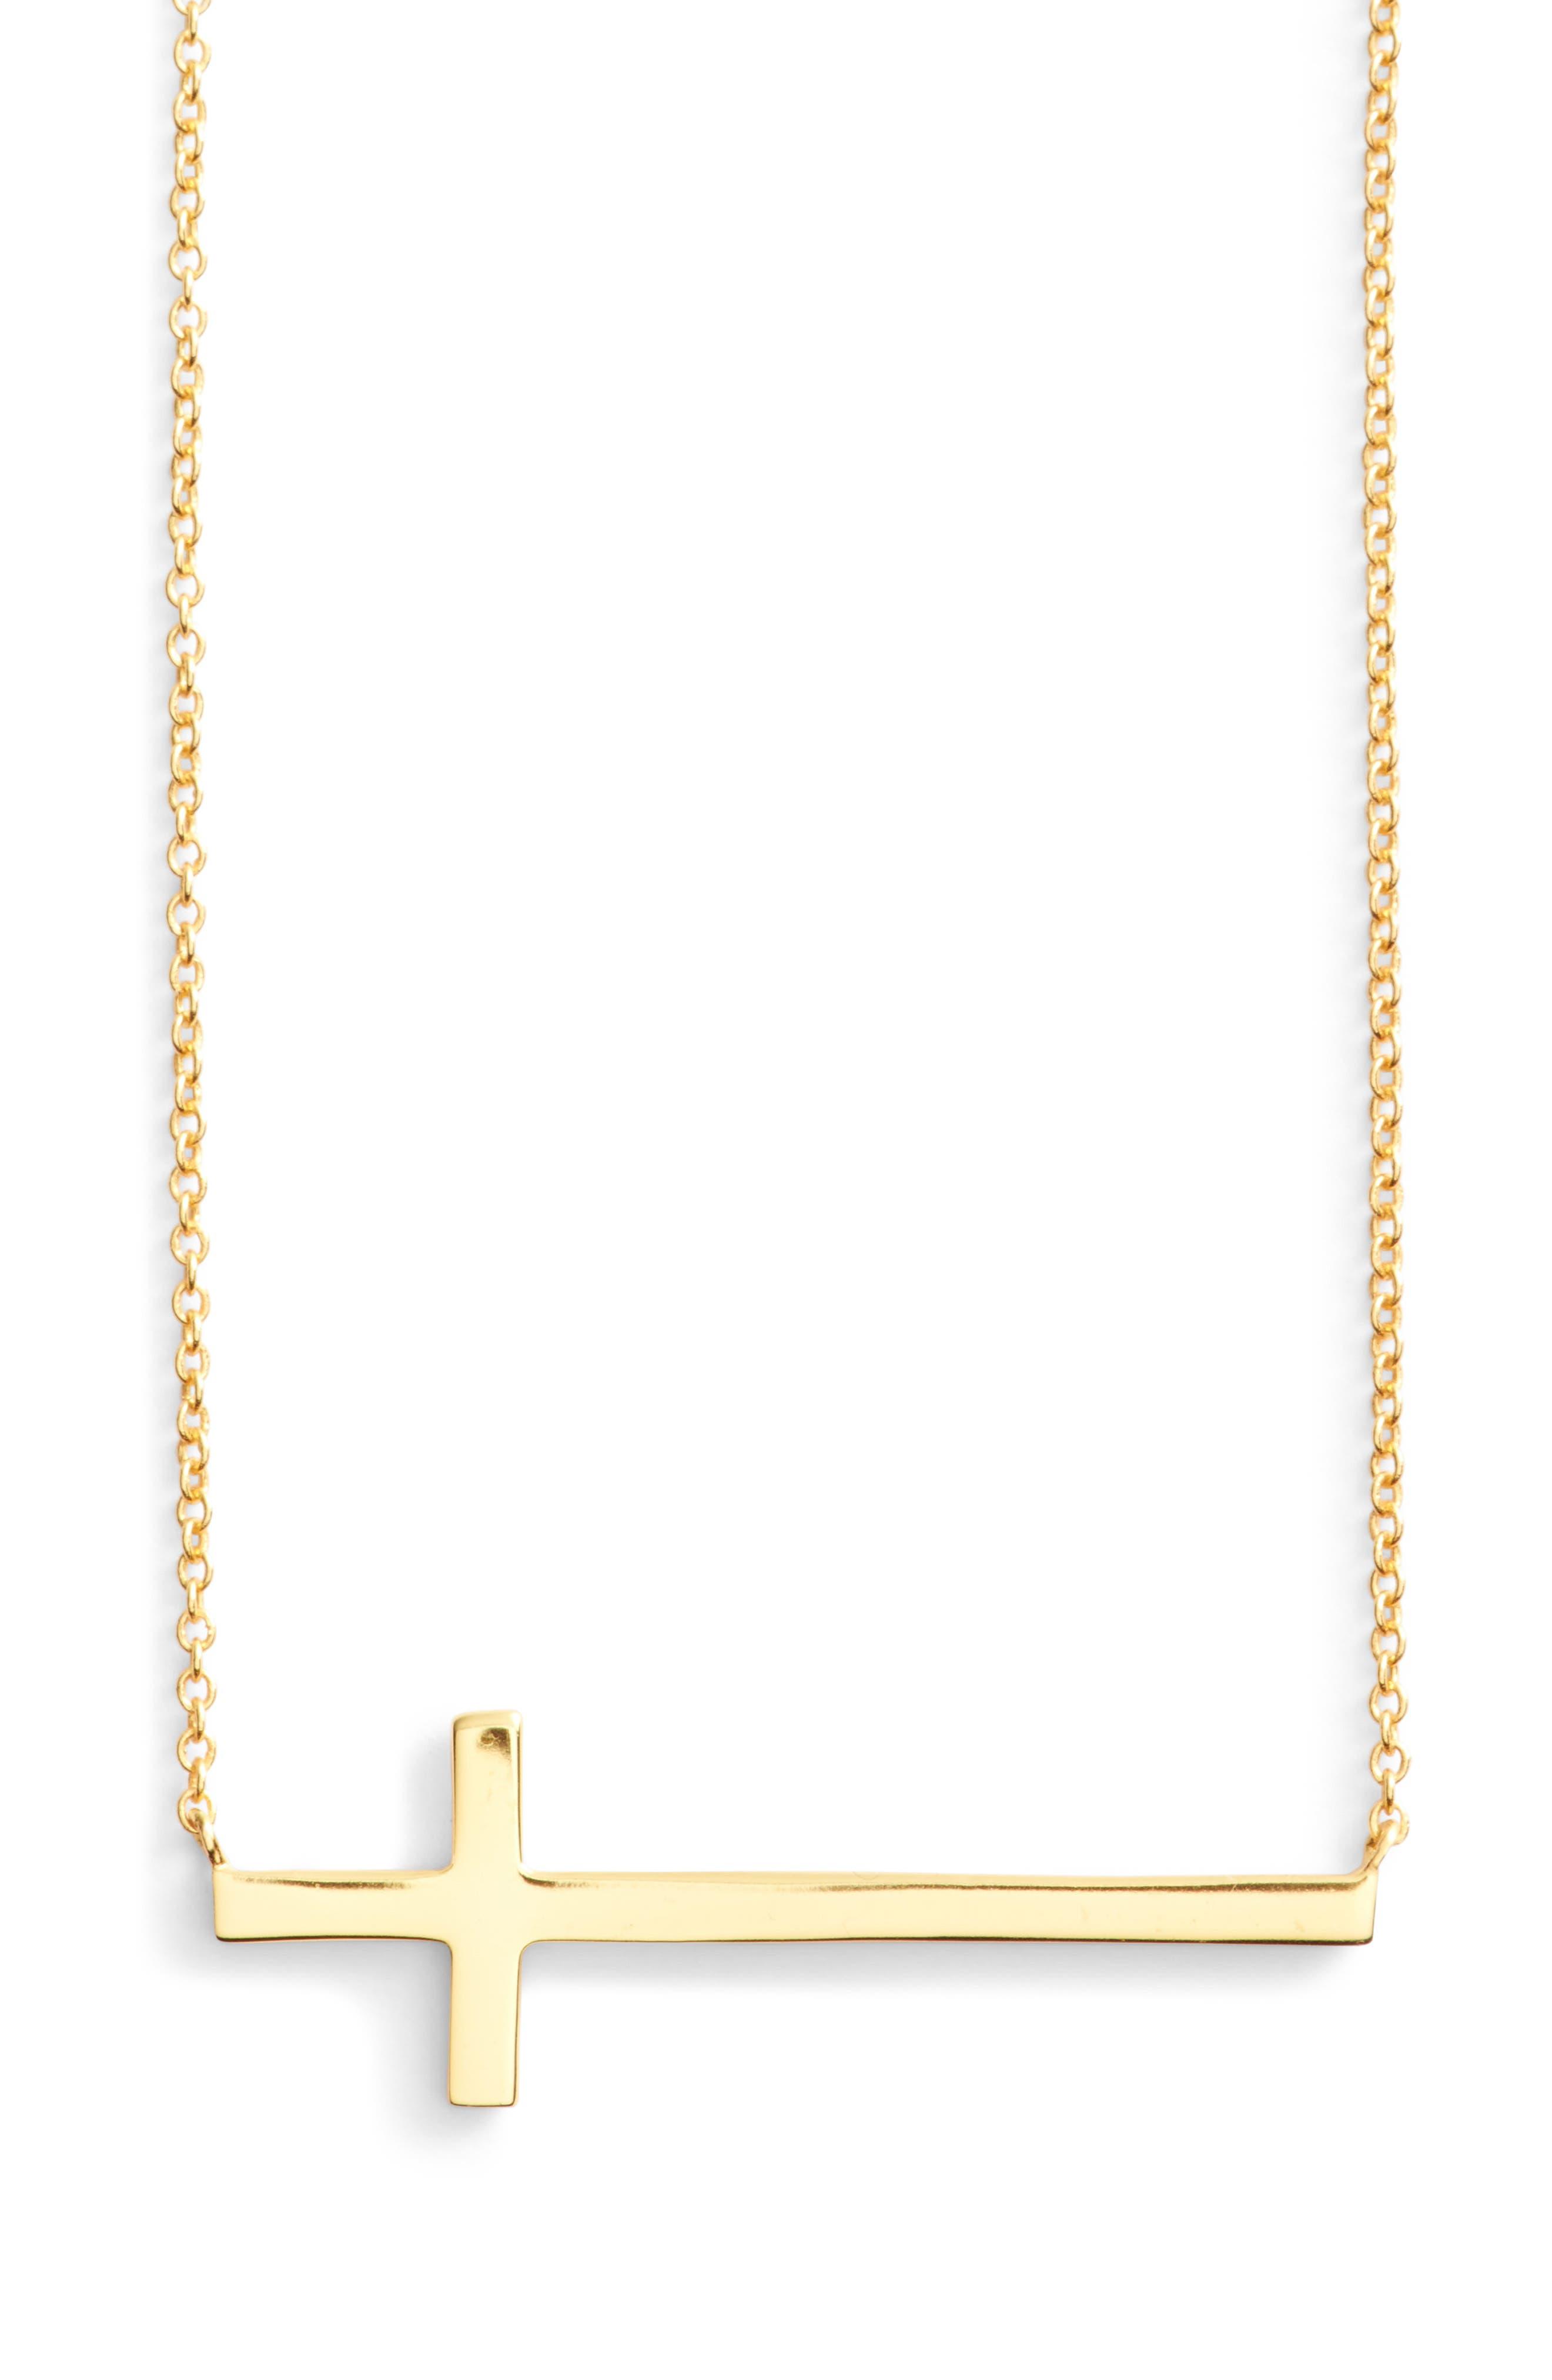 Argento vivo modern sideways cross pendant necklace gold modesens argento vivo modern sideways cross pendant necklace gold aloadofball Choice Image